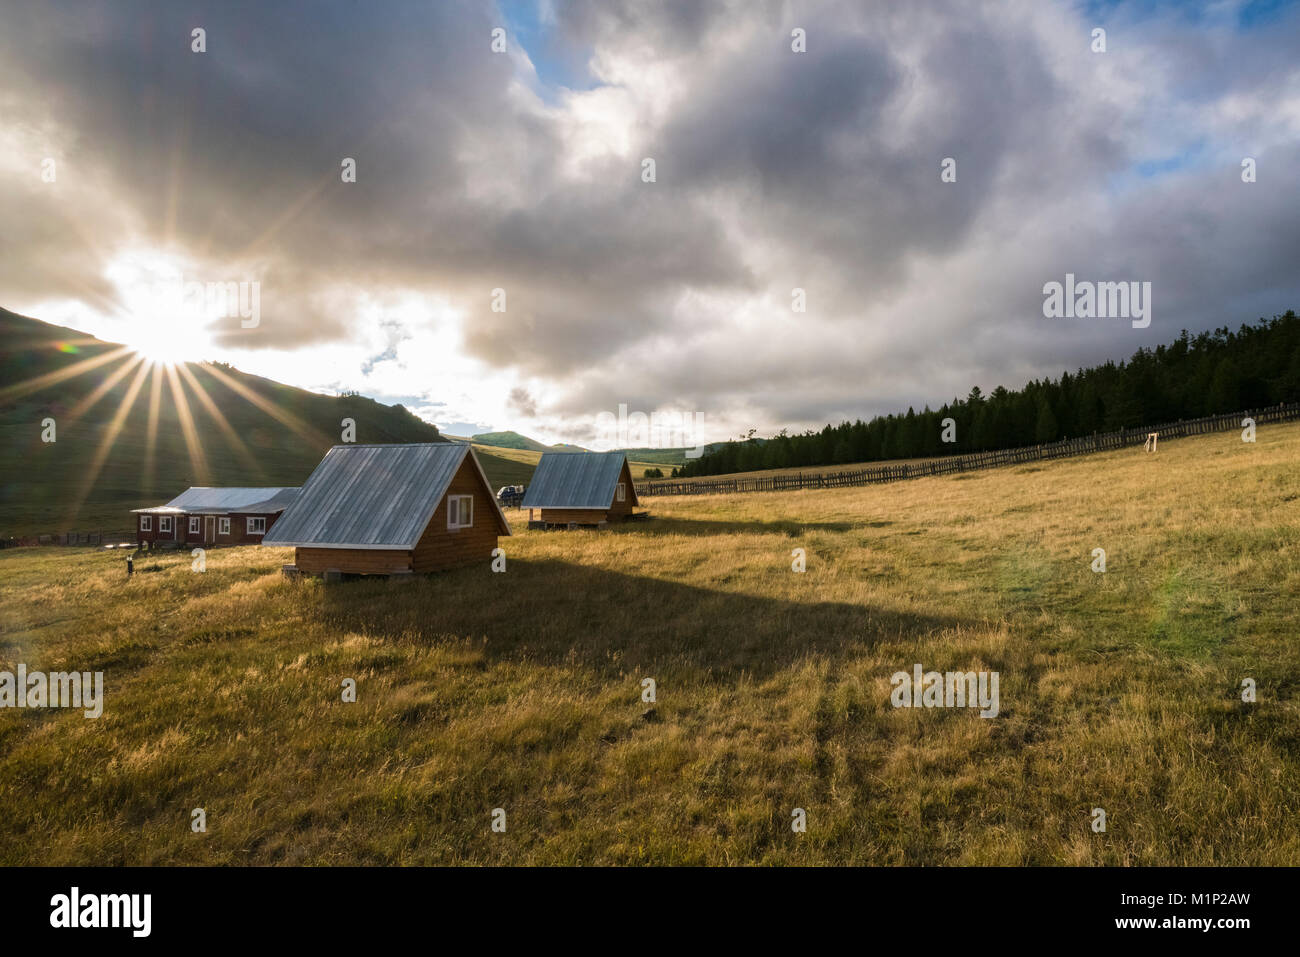 Holzhäuser bei Sonnenaufgang, Burentogtokh Bezirk, Provinz Hovsgol, Mongolei, Zentralasien, Asien Stockbild